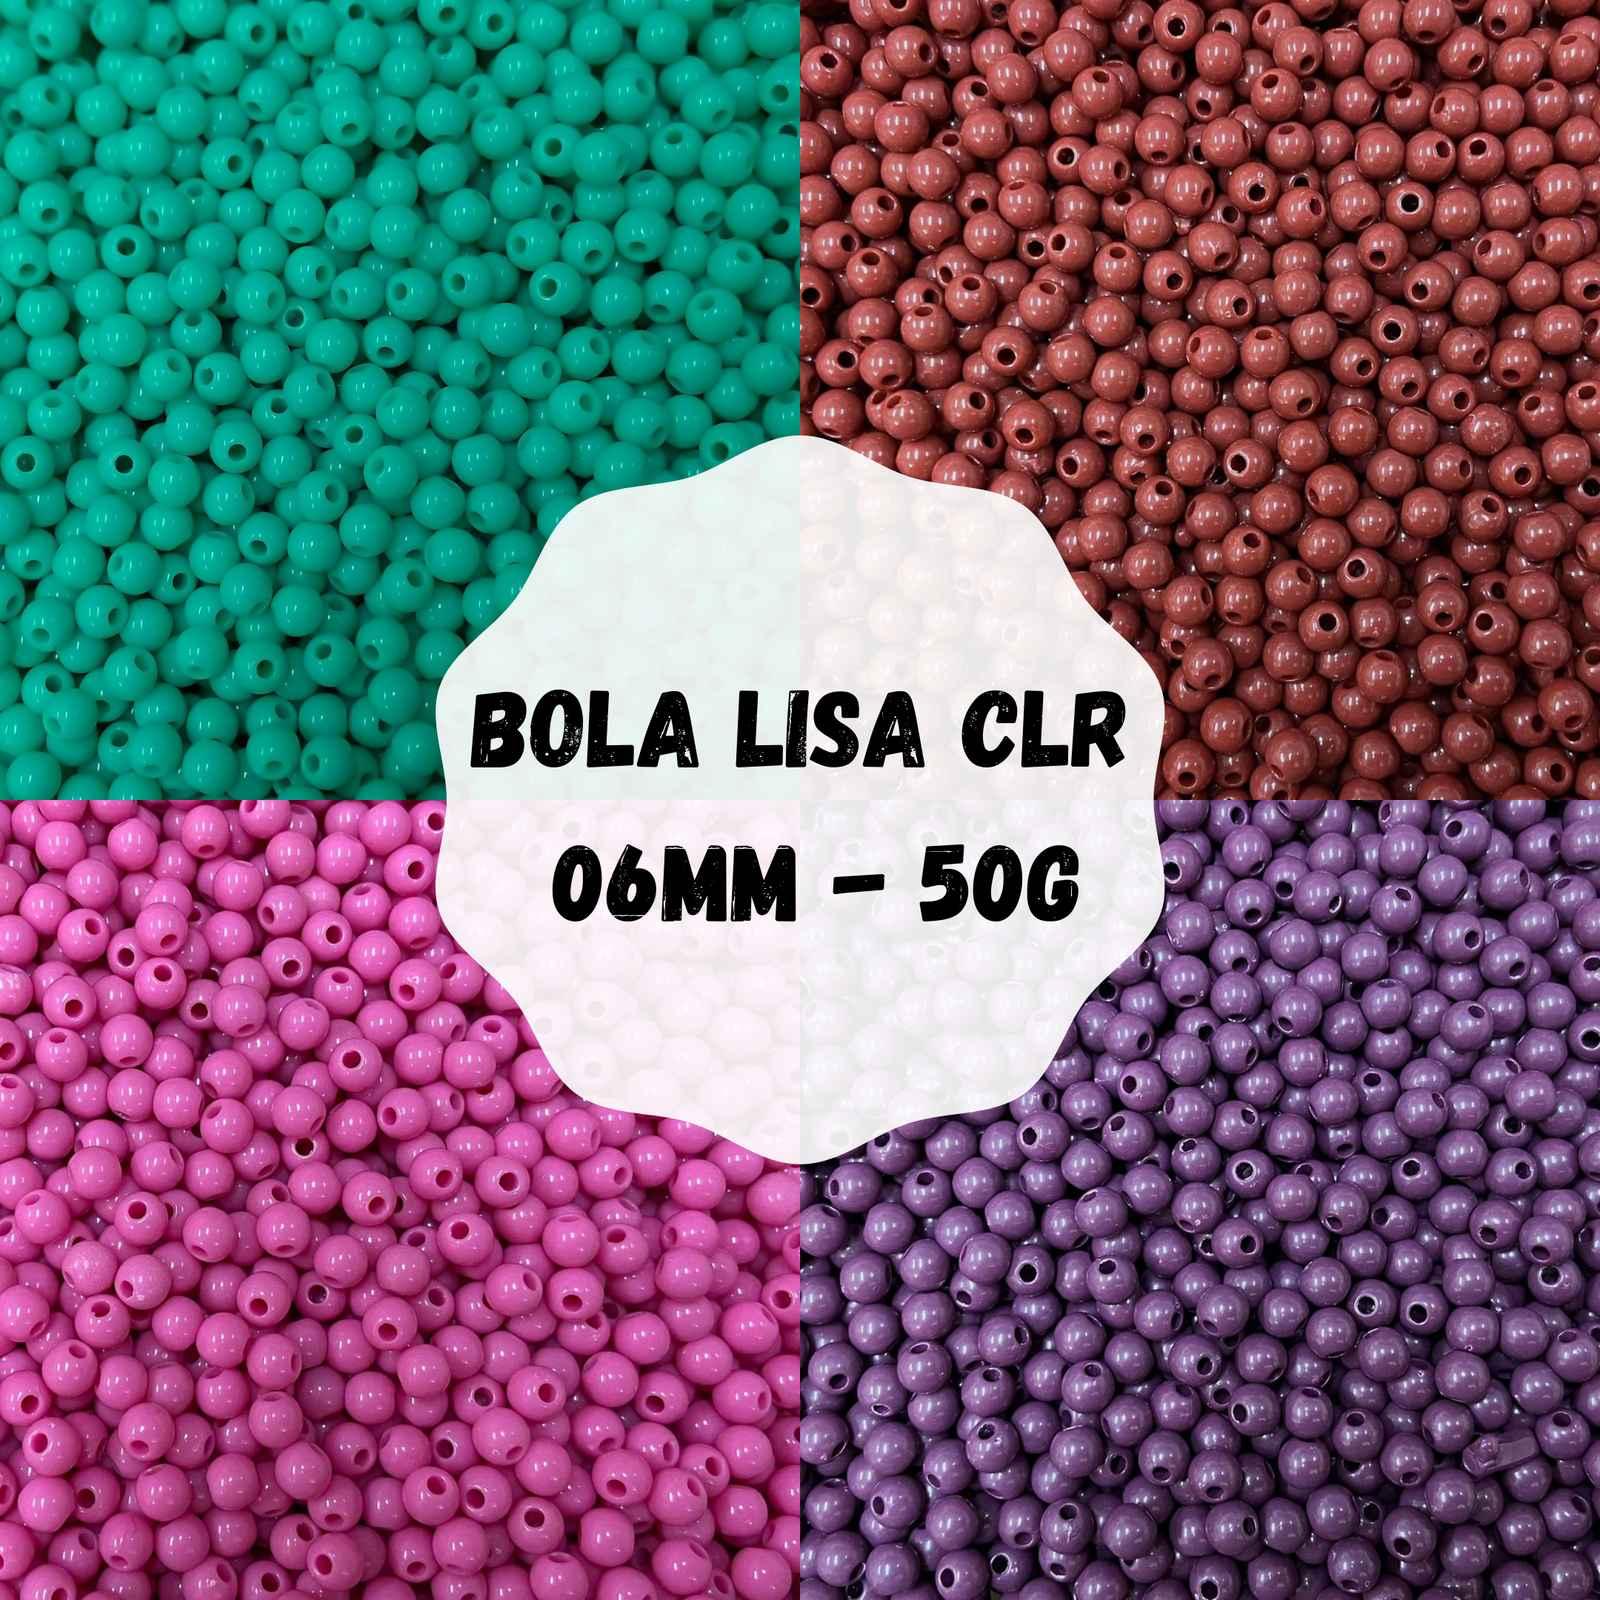 Bola Lisa CLR 06mm - 50g